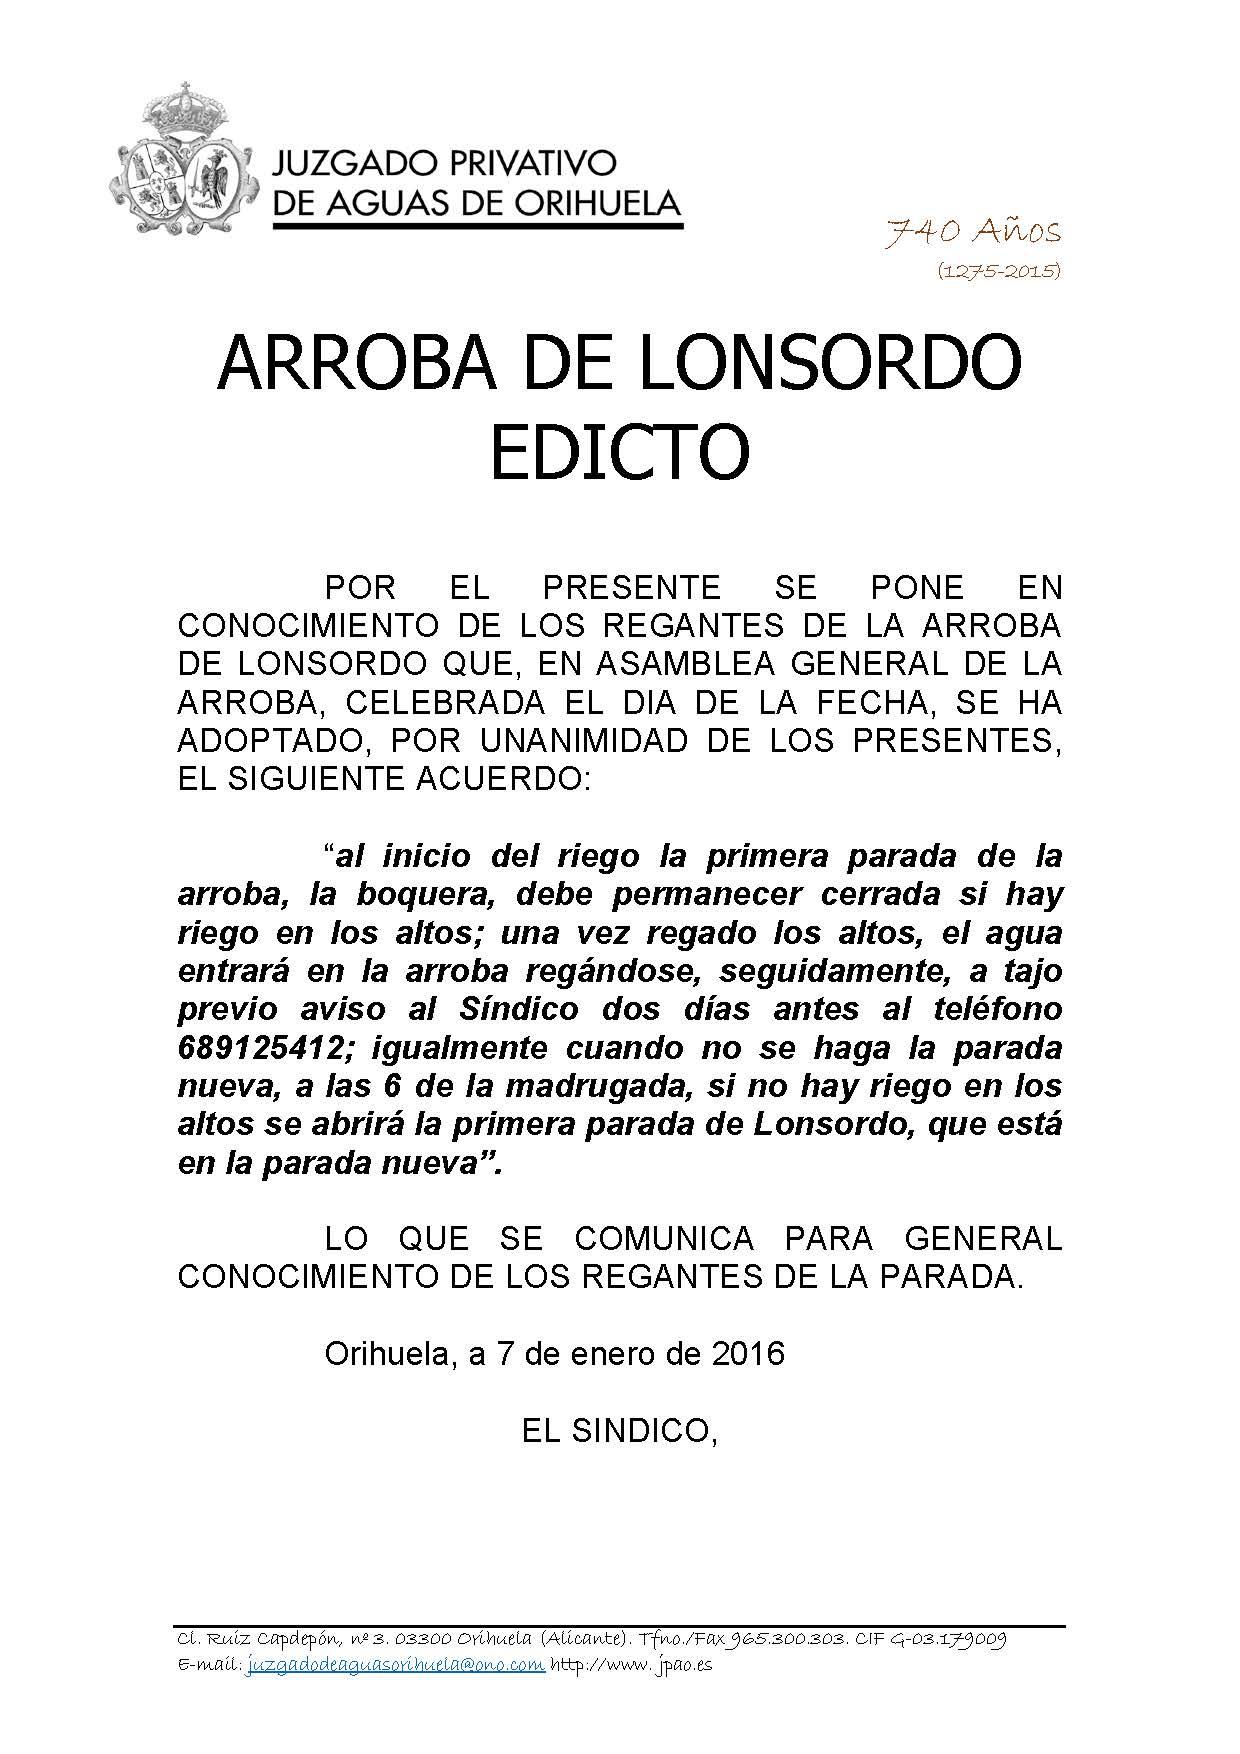 213 2015 arroba de lonsordo. edicto de fecha 07012016